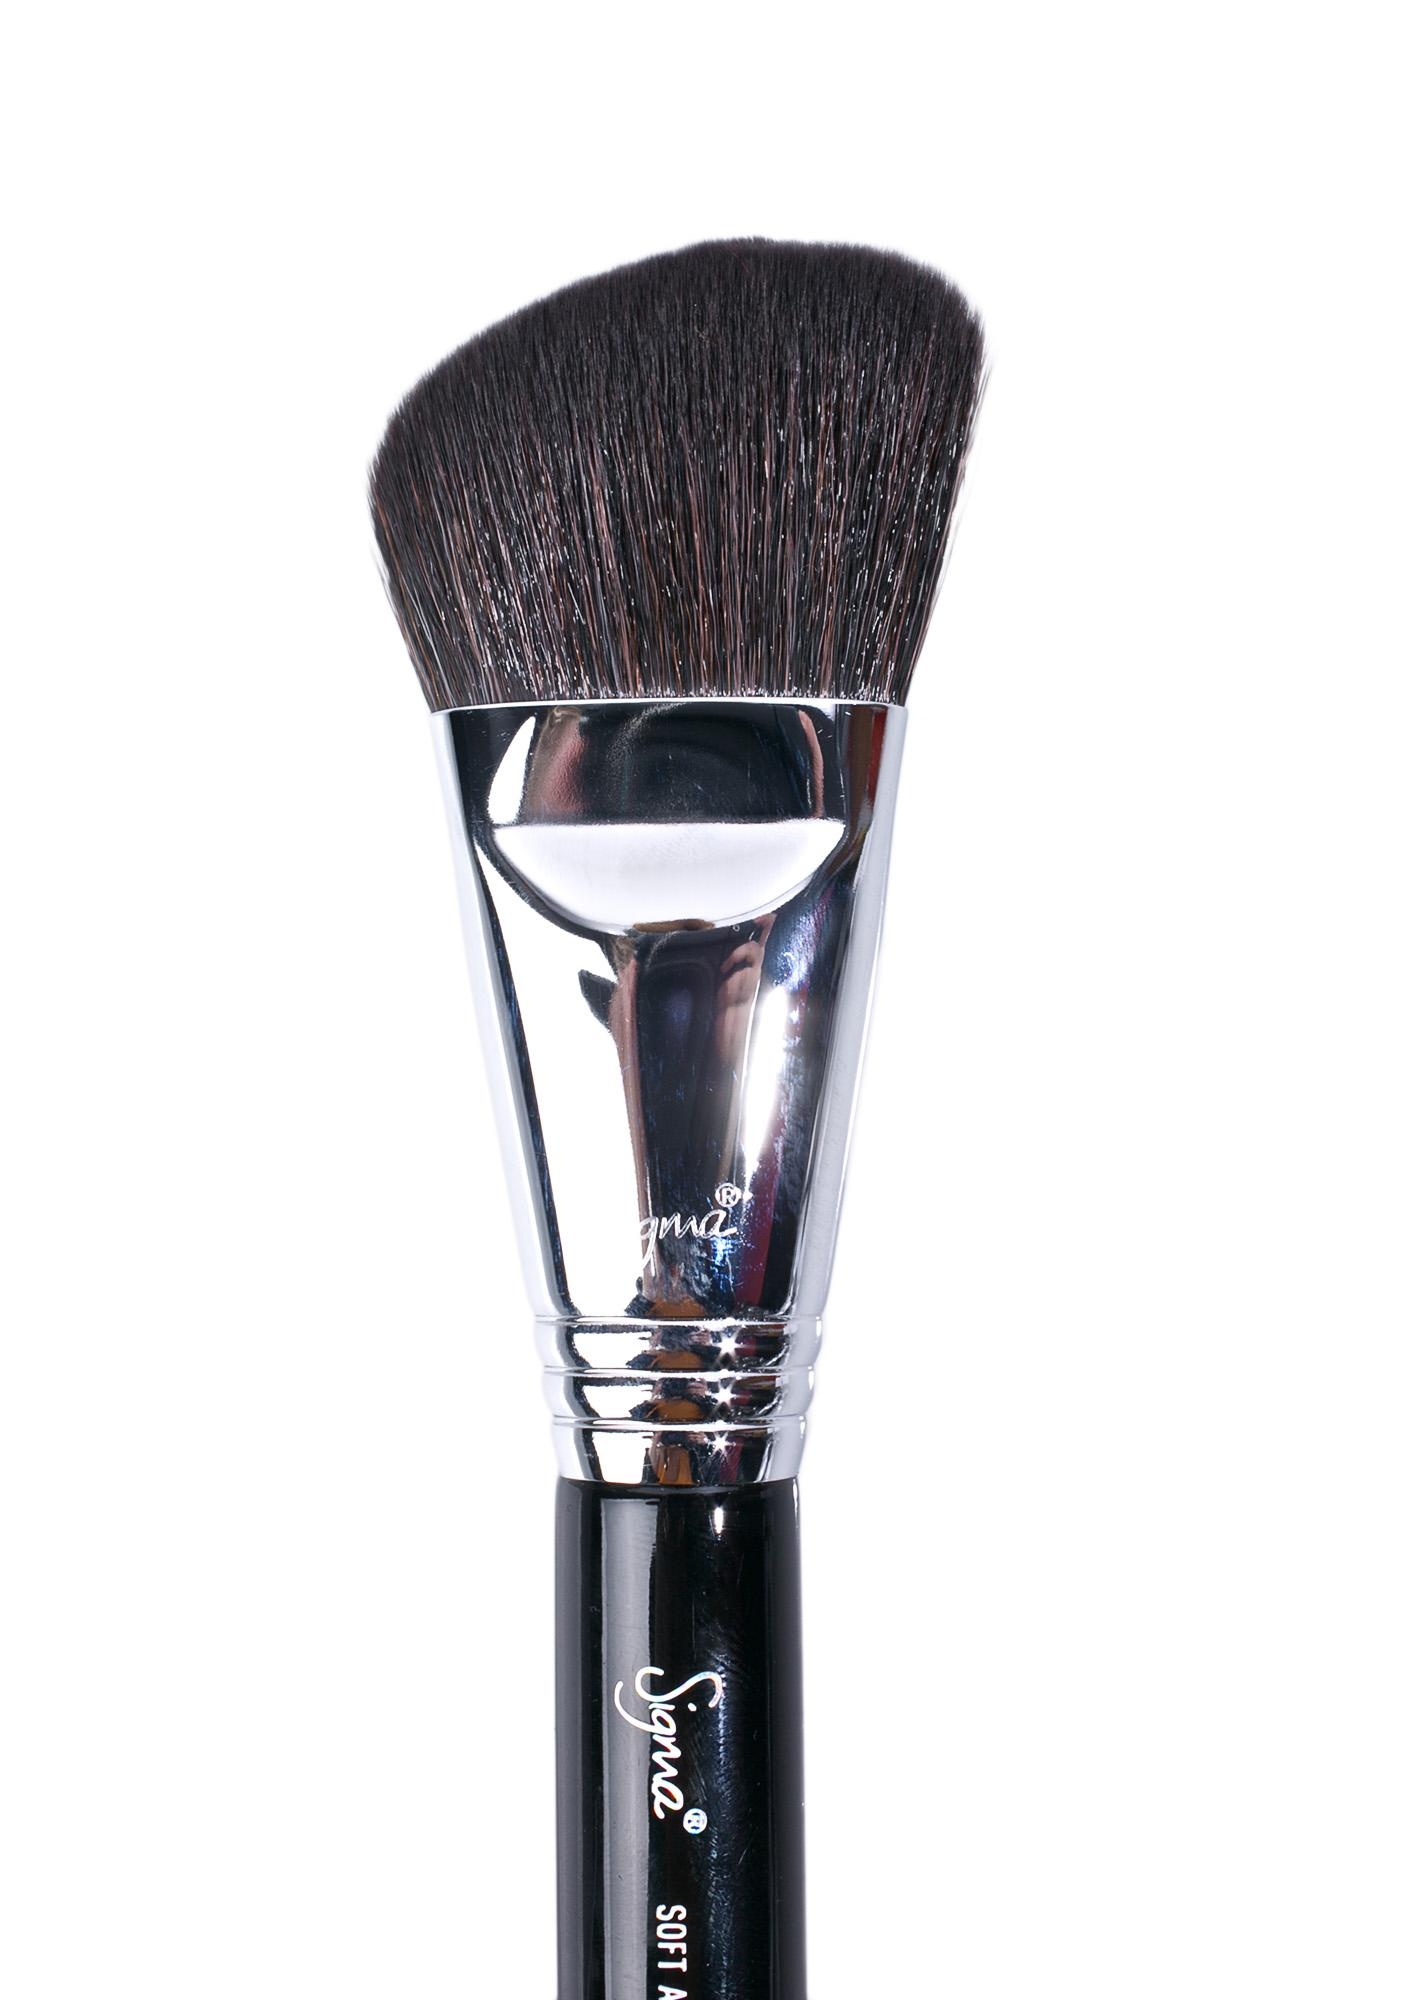 Sigma Soft Angled Contour Brush